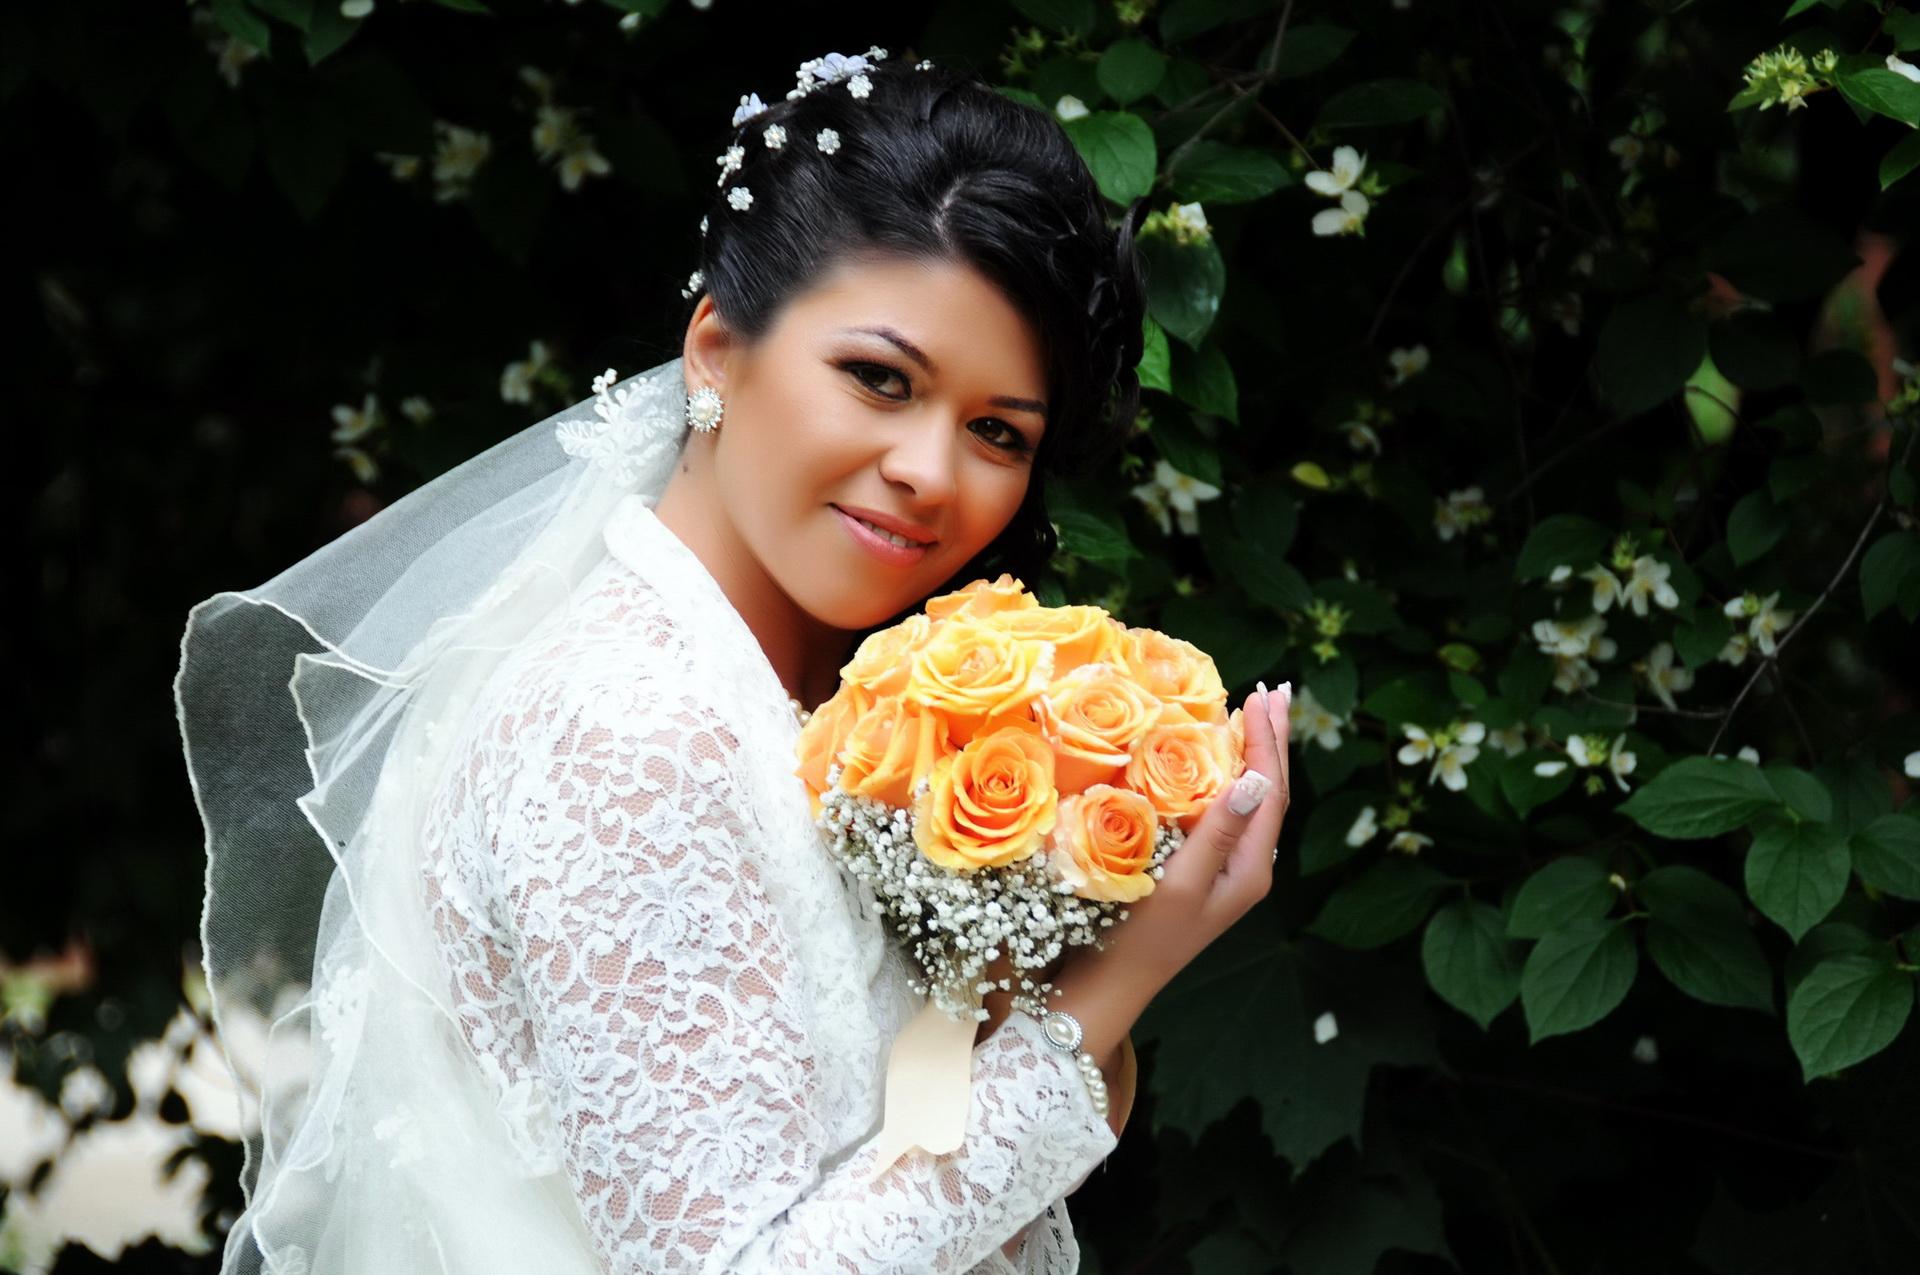 Servicii Foto Video Pentru Nunti Botezuri Si Alte Evenimente